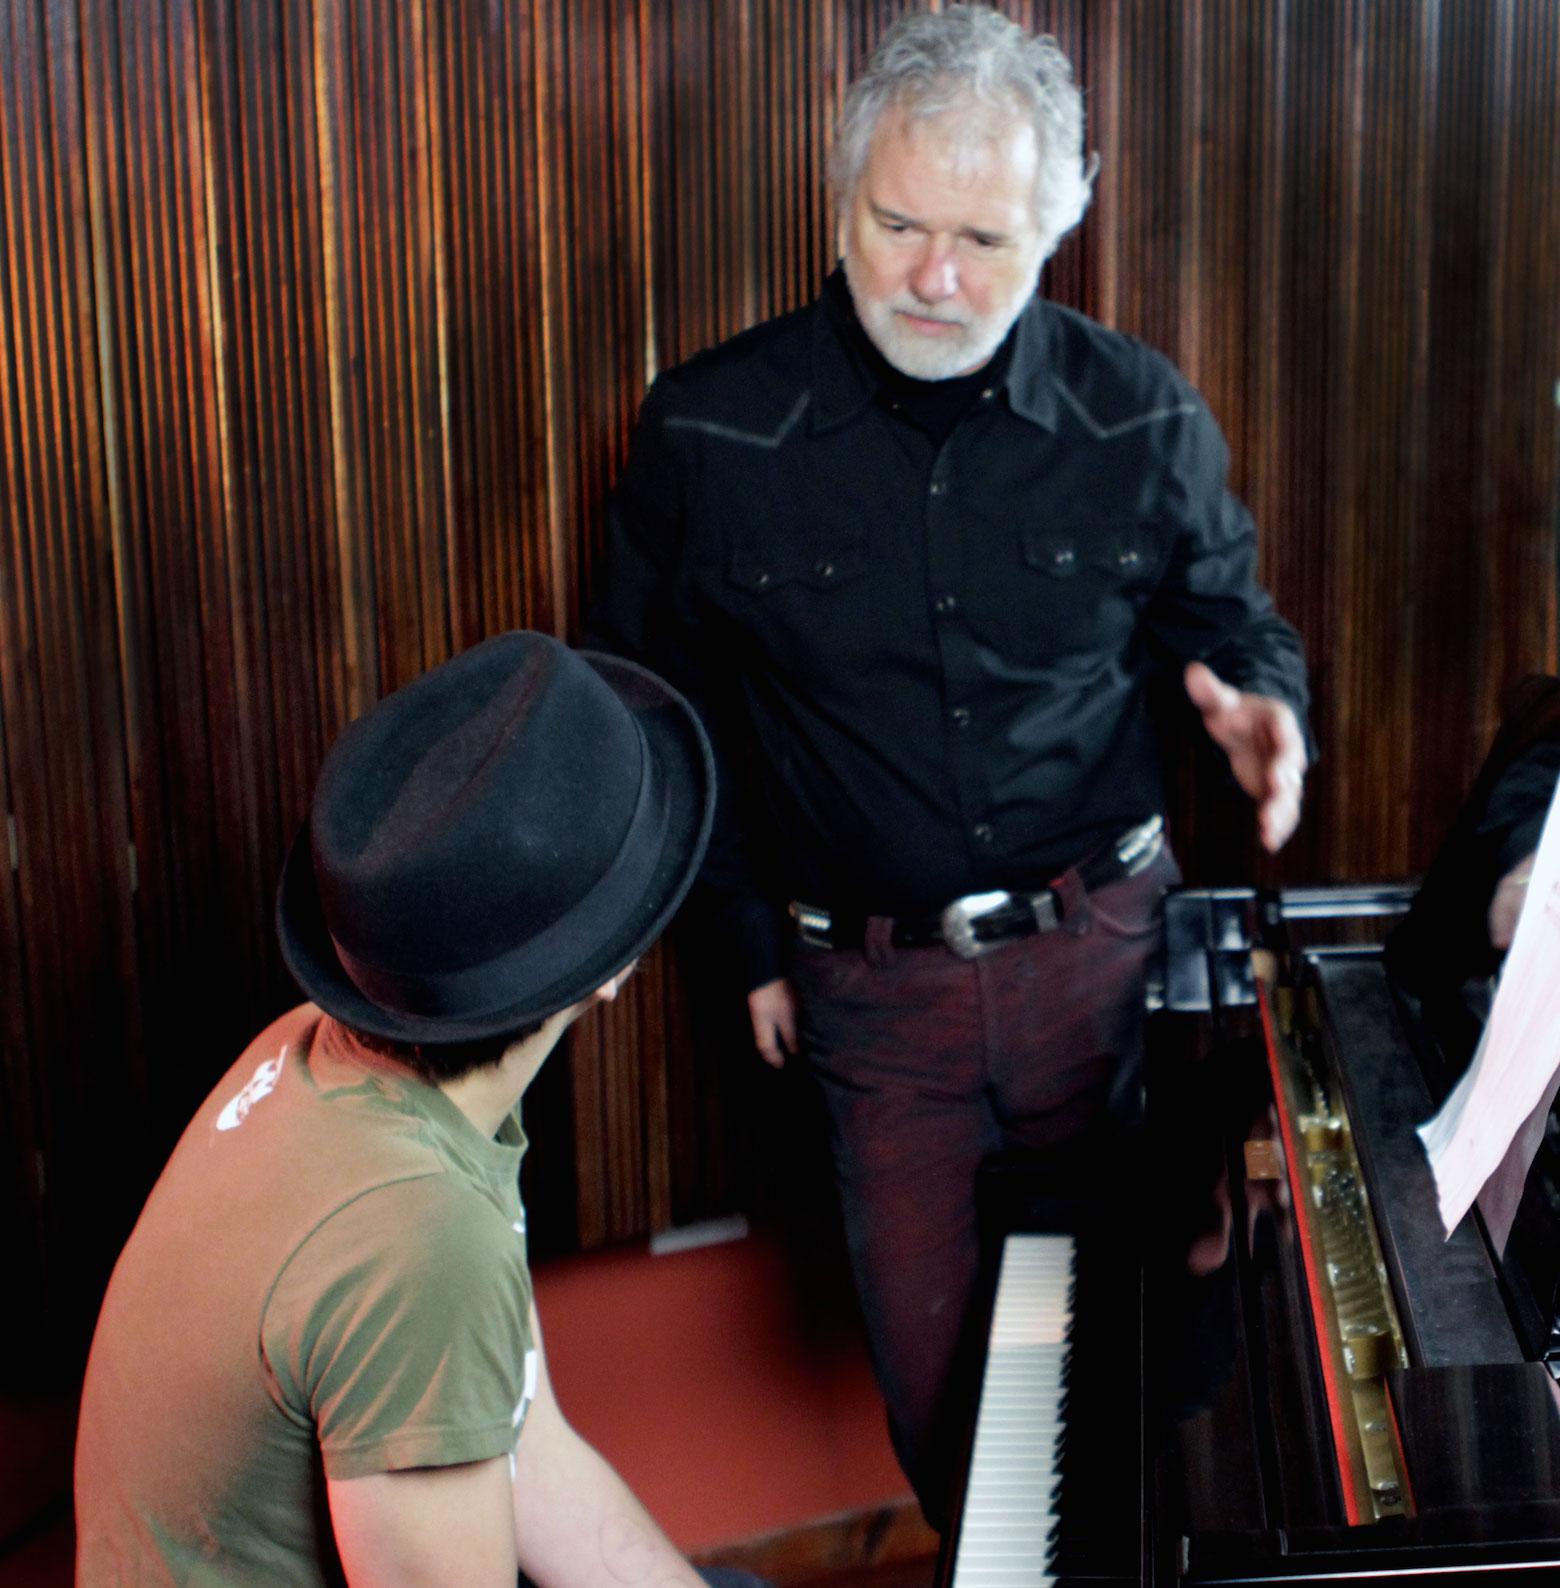 IROCKU Method_Chuck Leavell teaching piano student